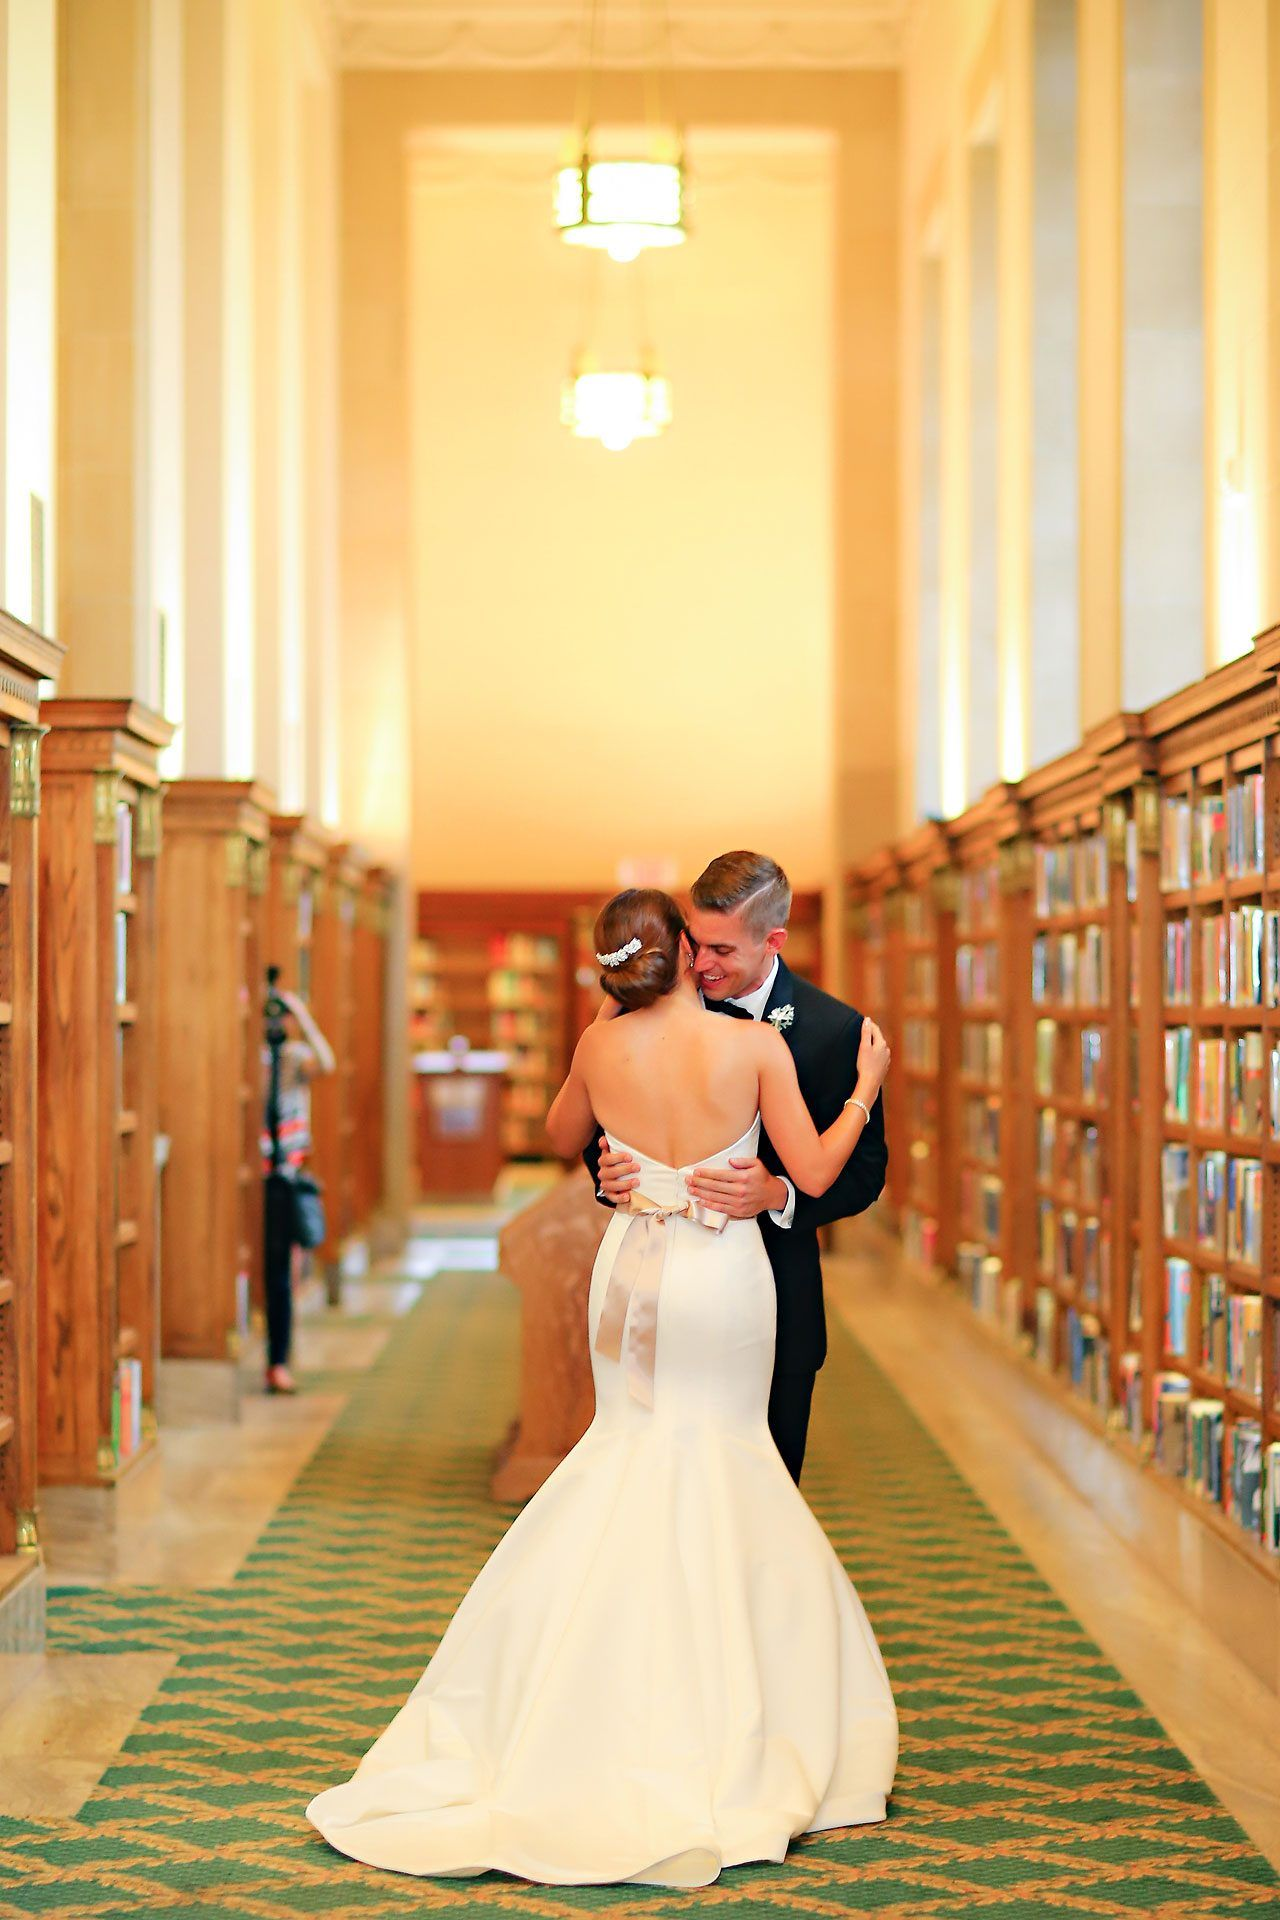 Christine Ryan Jessica Strickland International Fine Art And Wedding Photojournalist Library Wedding Wedding Indianapolis Library